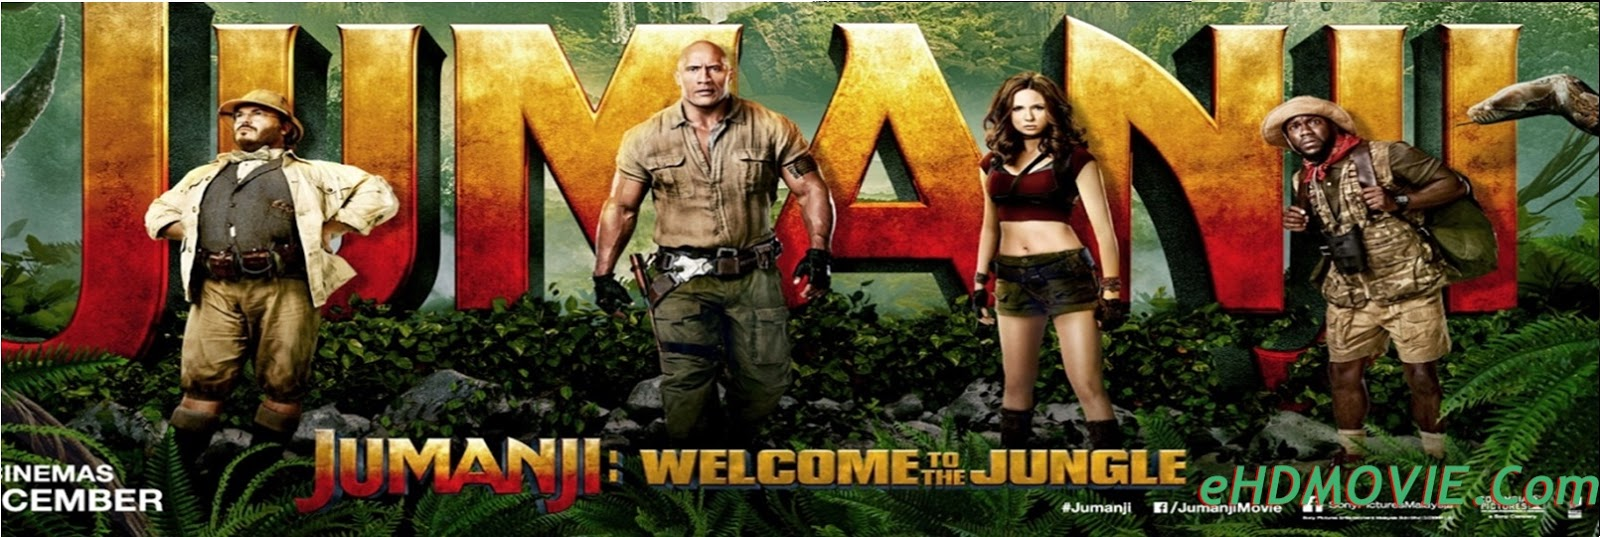 Jumanji Welcome to the Jungle 2017 Full Movie Dual Audio [Hindi – English] 1080p - 720p - HEVC - 480p ORG BRRip 400MB - 550MB – 1.4GB - 2.3GB ESubs Free Download